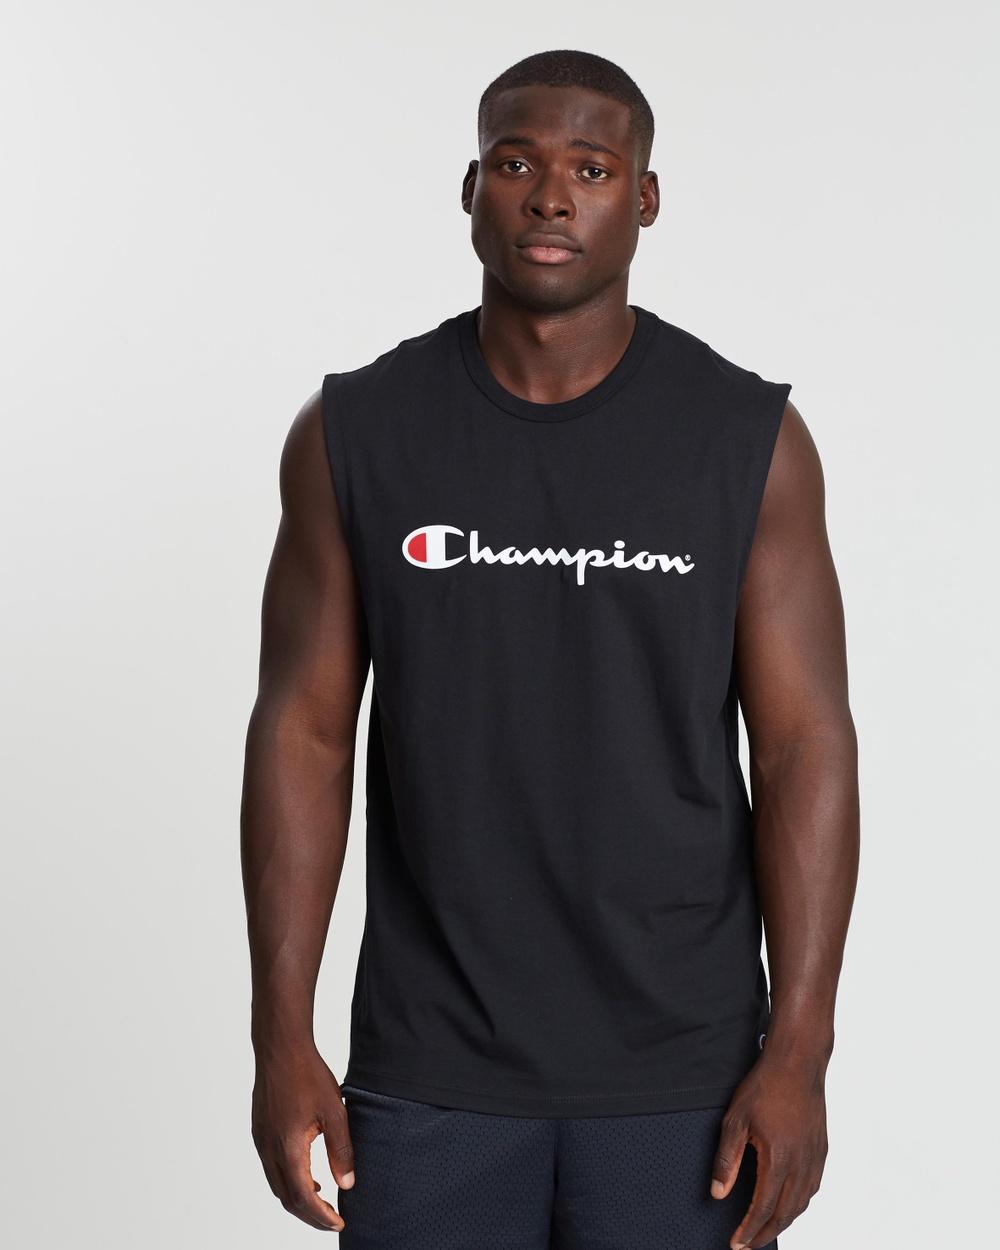 Champion Script Muscle Tank Tops Black Australia